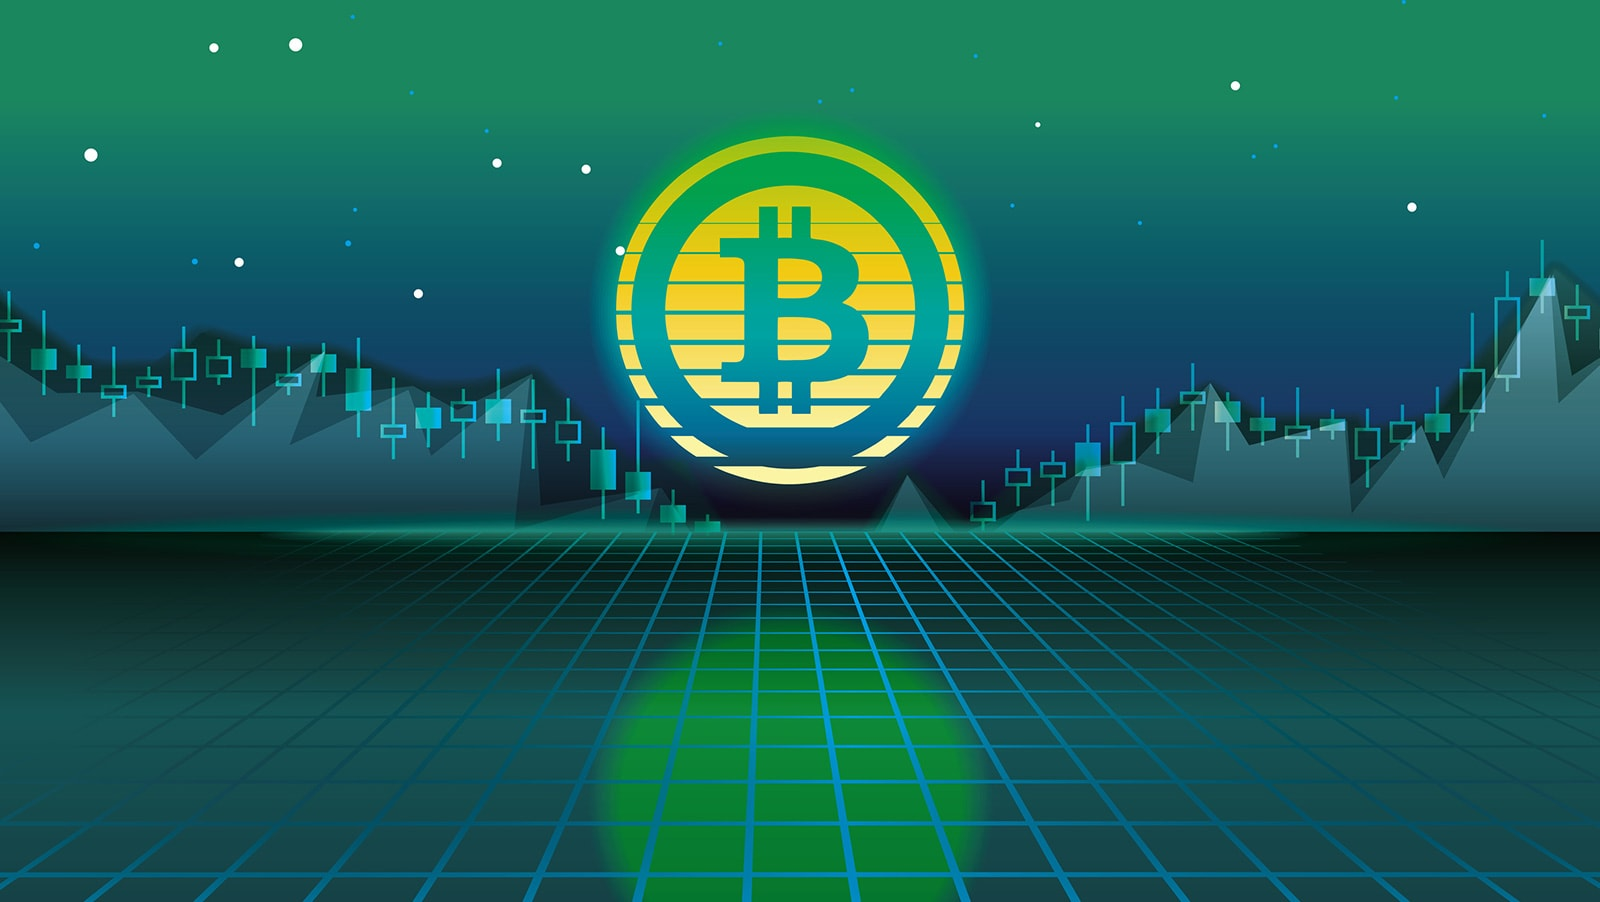 BTC 2 - تحلیل تکنیکال بیت کوین: شنبه، 3 آبان